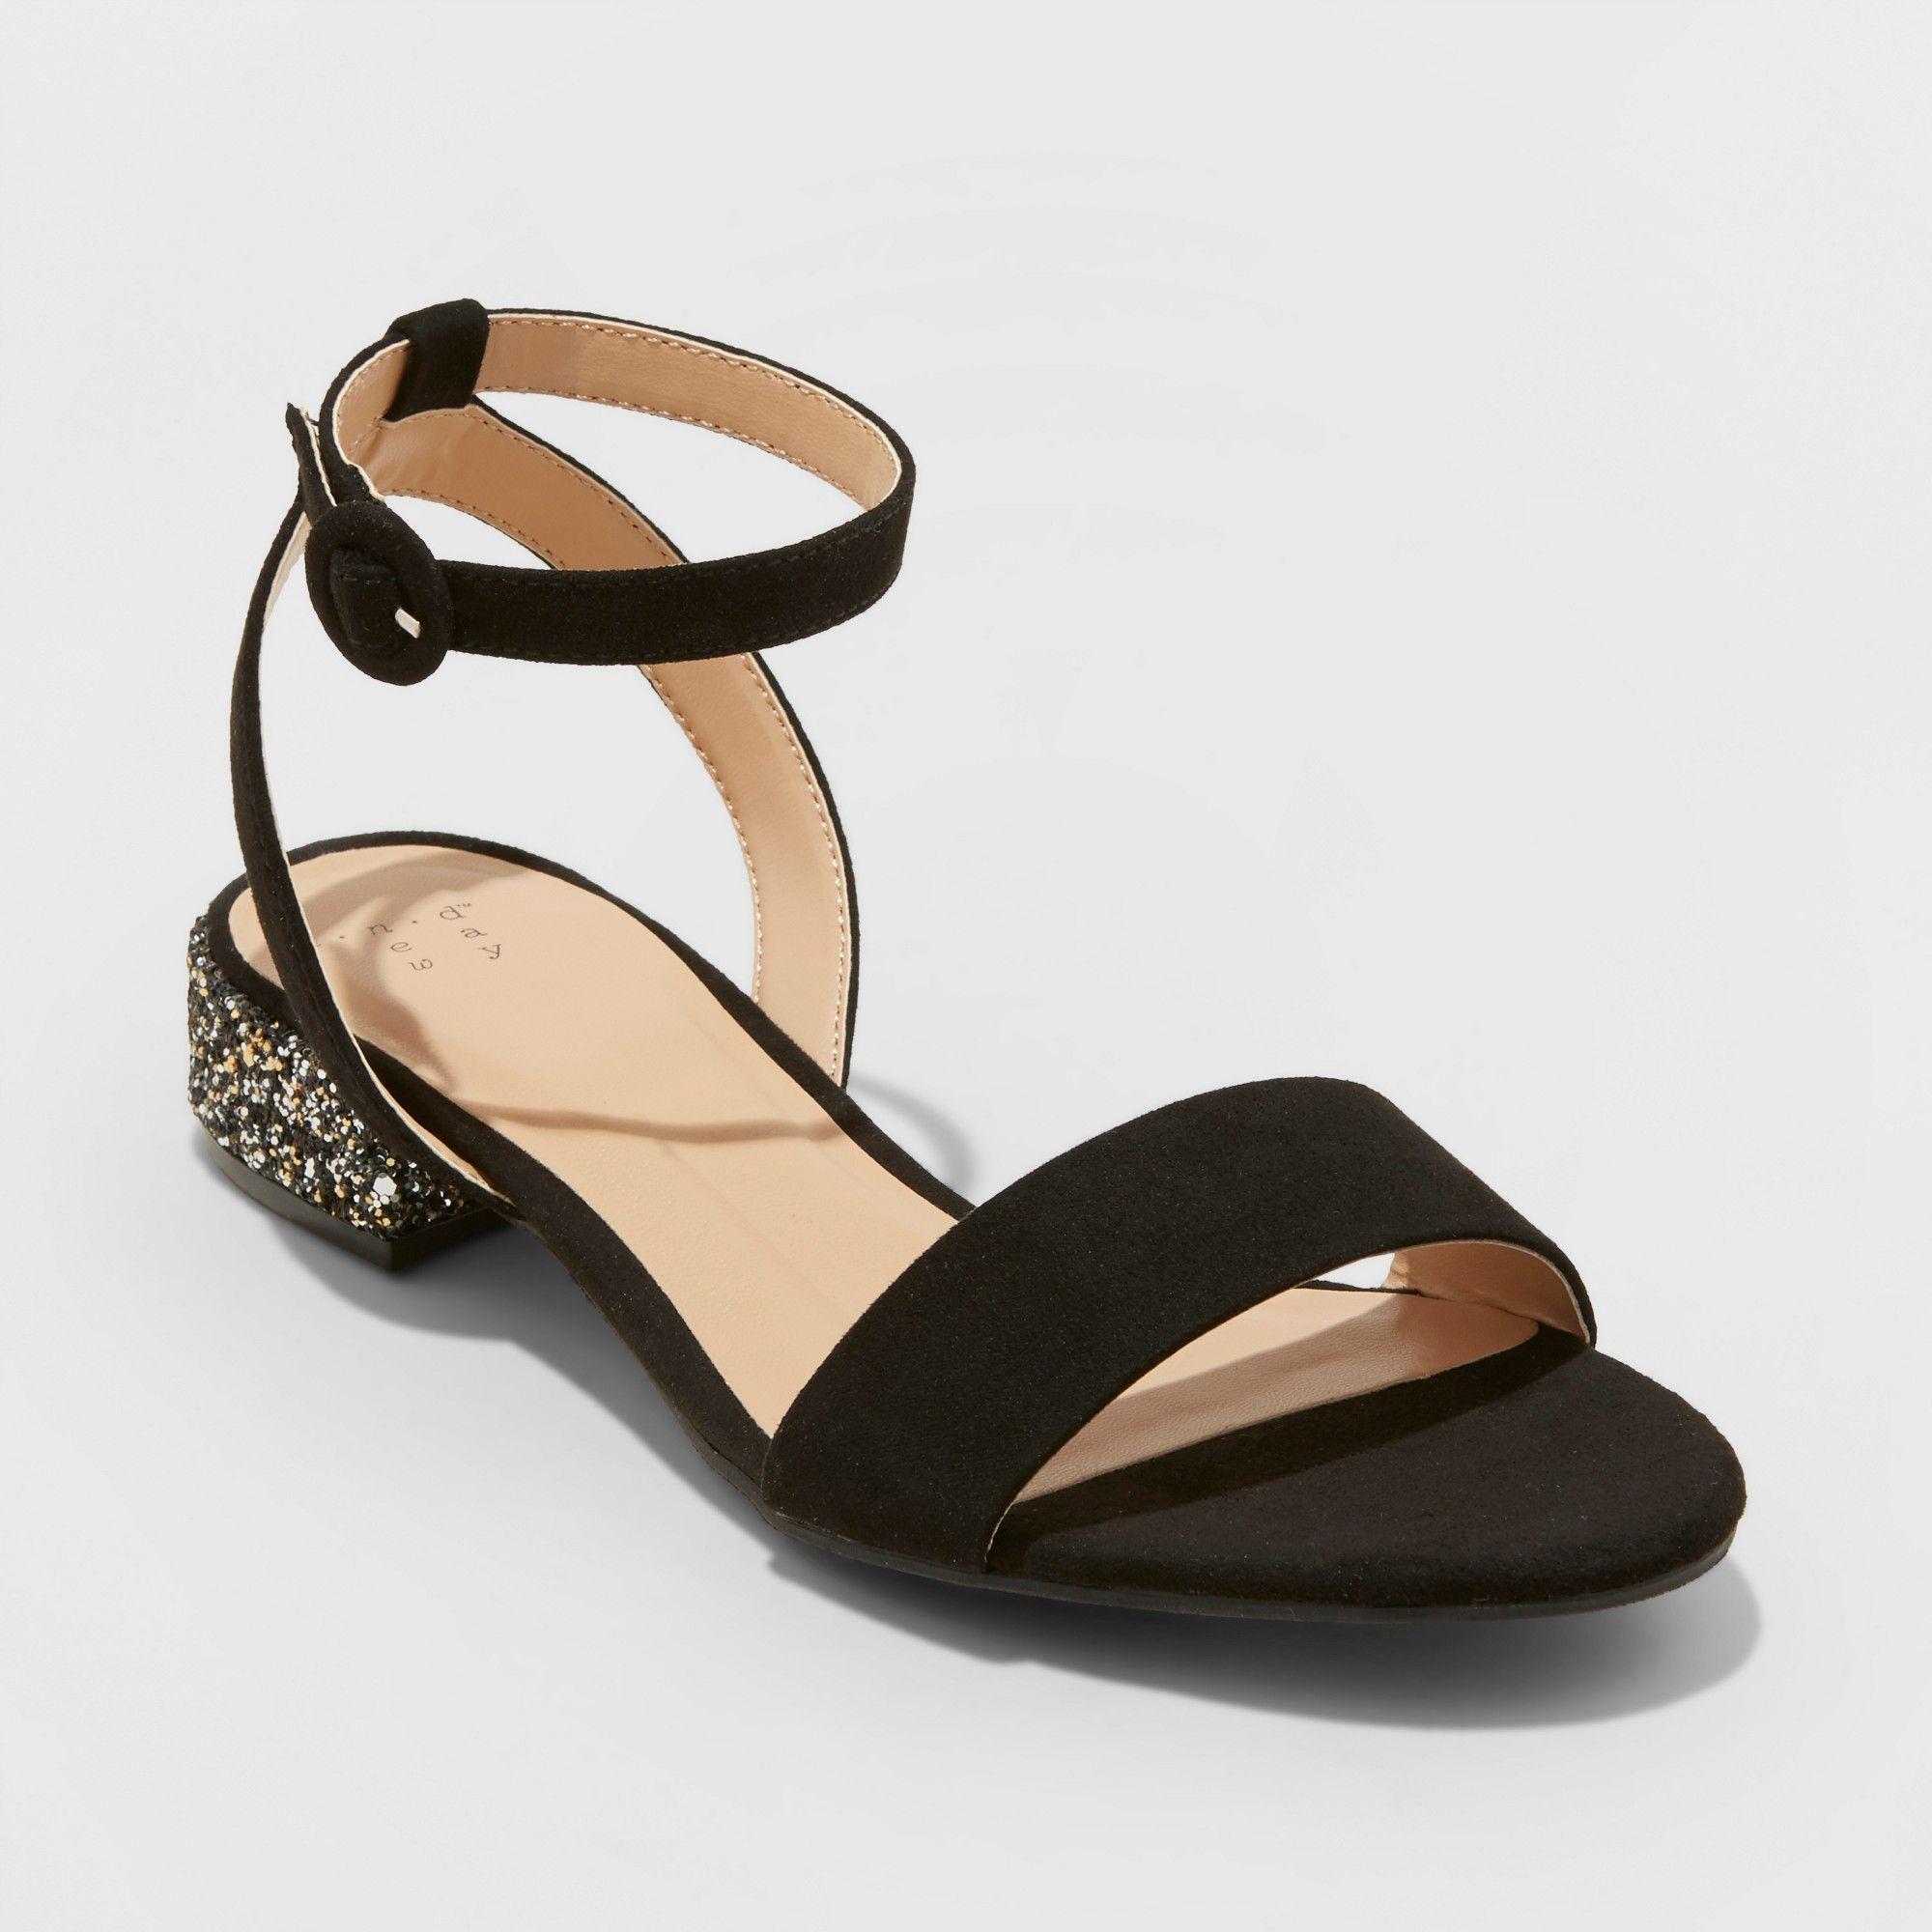 4b6c6f5fac5 Women s Winona Glitter Wide Width Ankle Strap Sandals - A New Day Black 8.5W